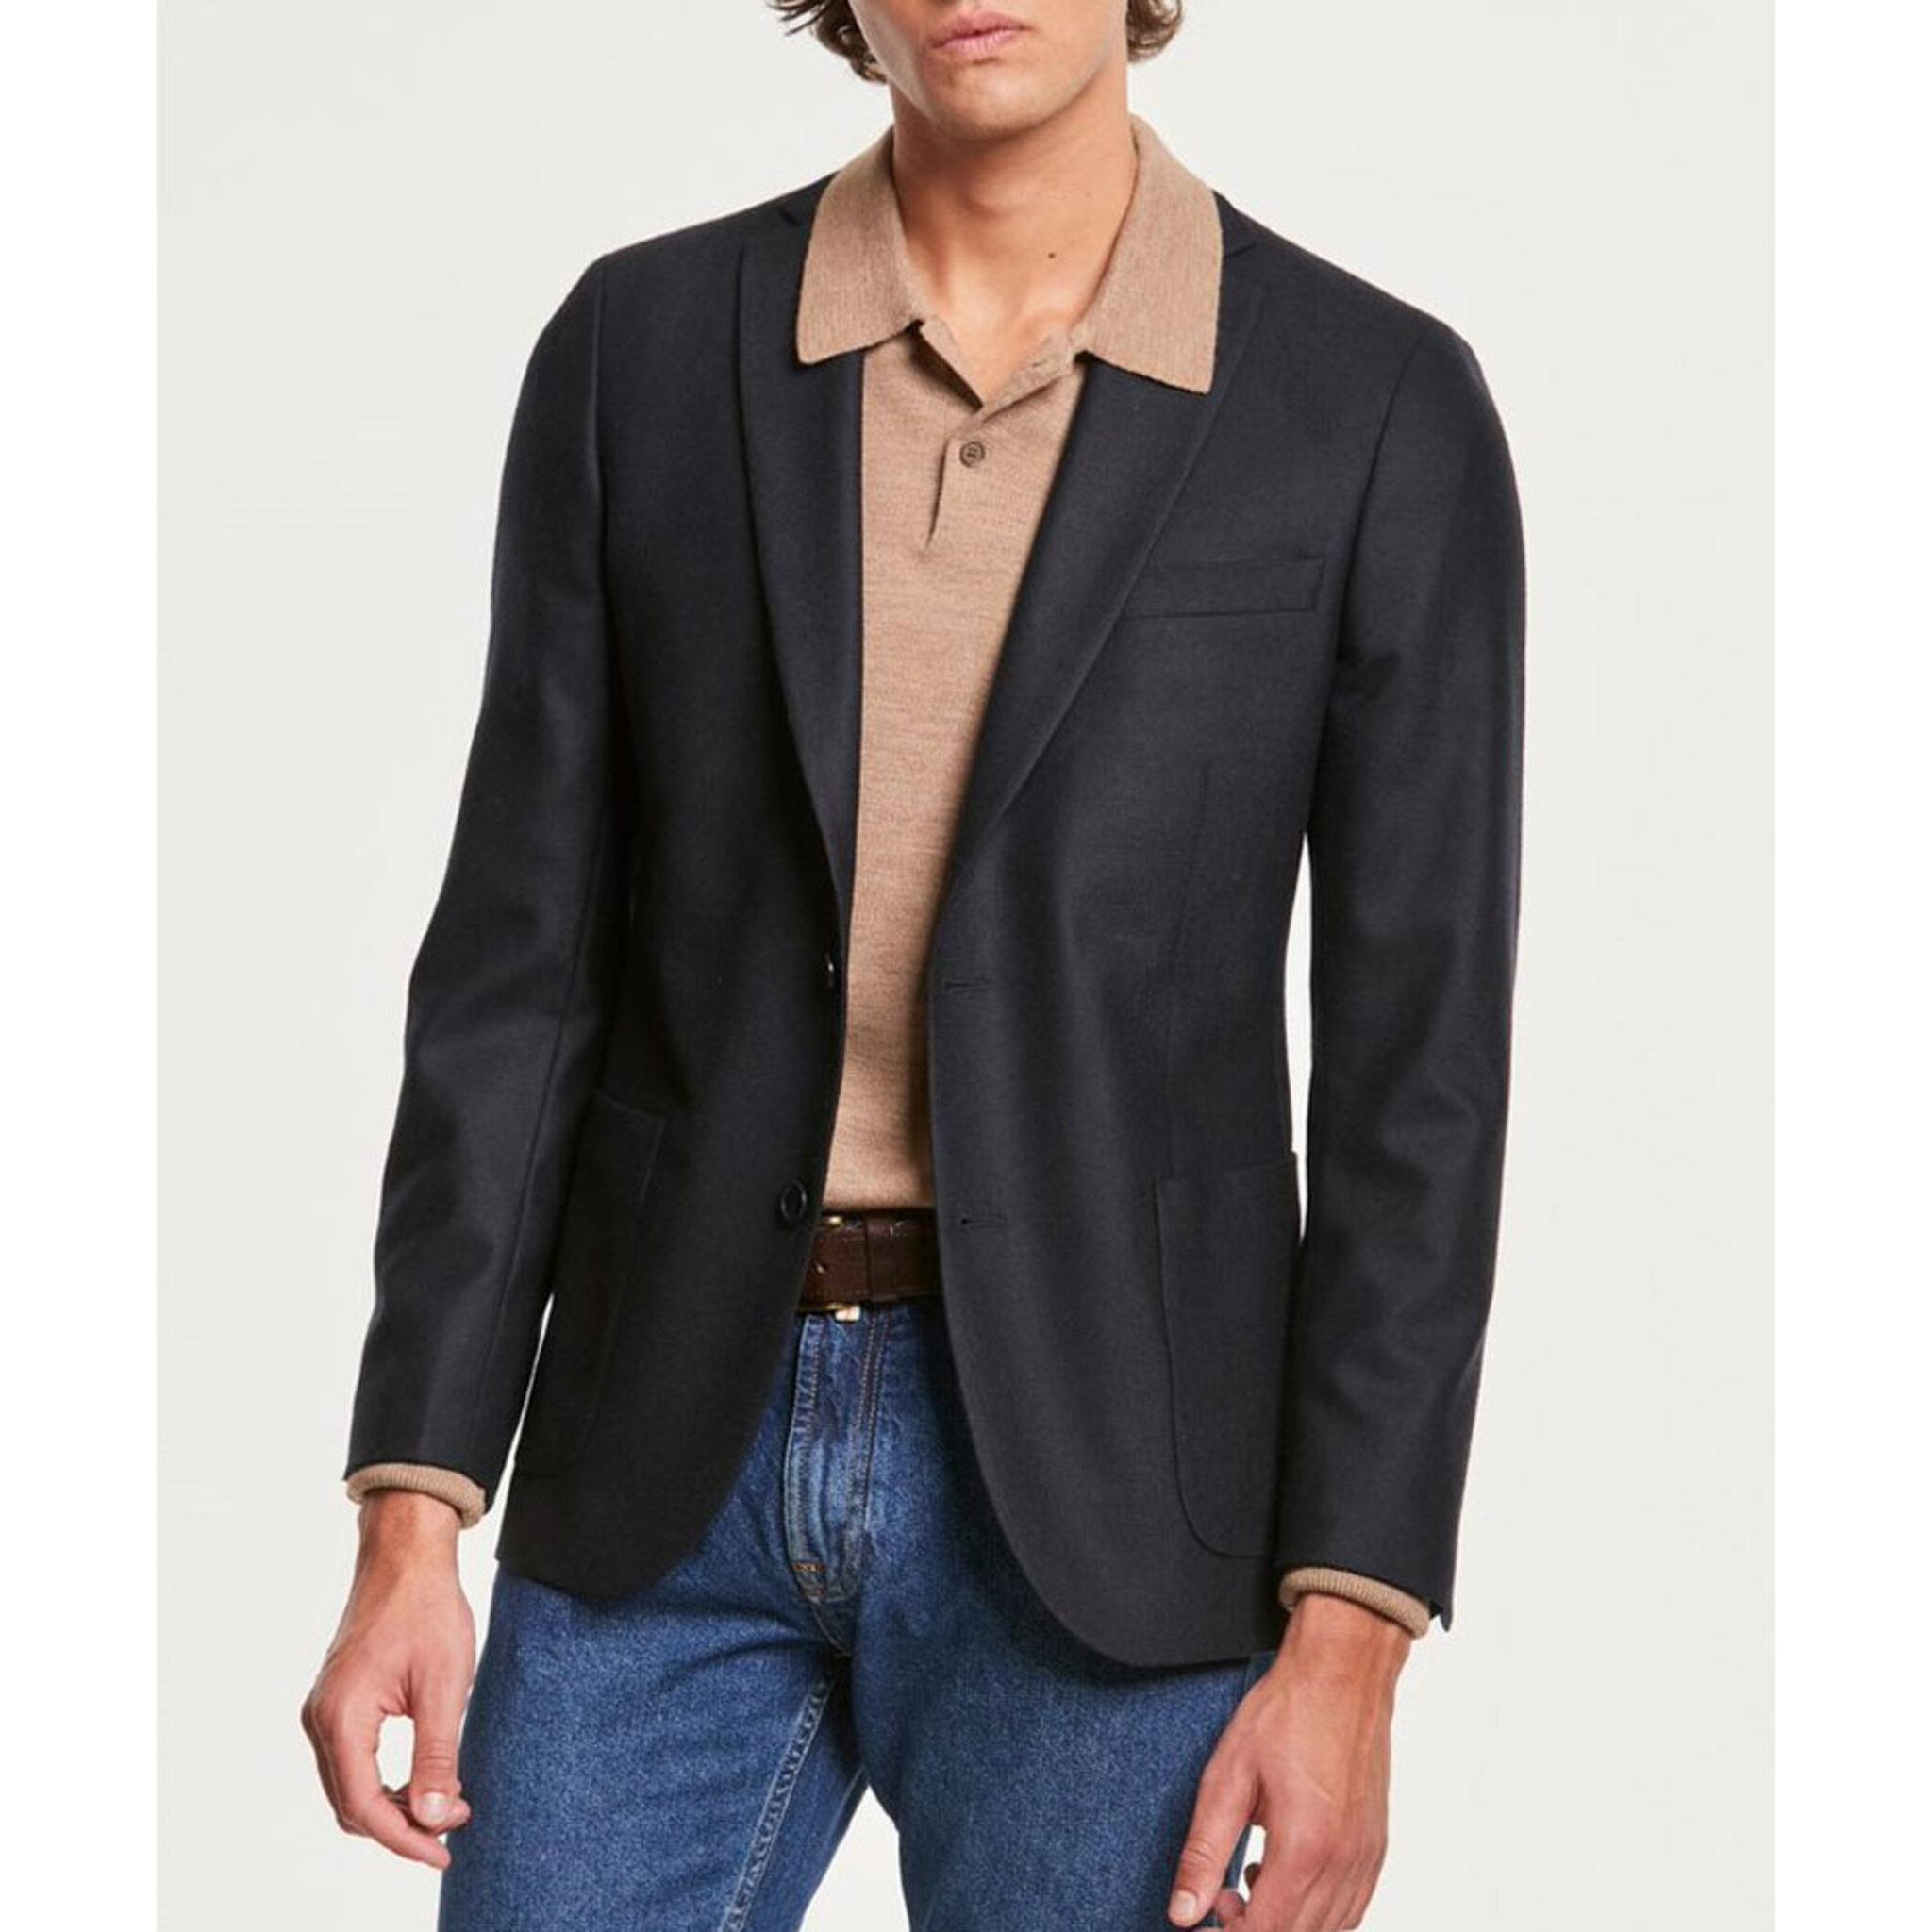 Flannel Jacket